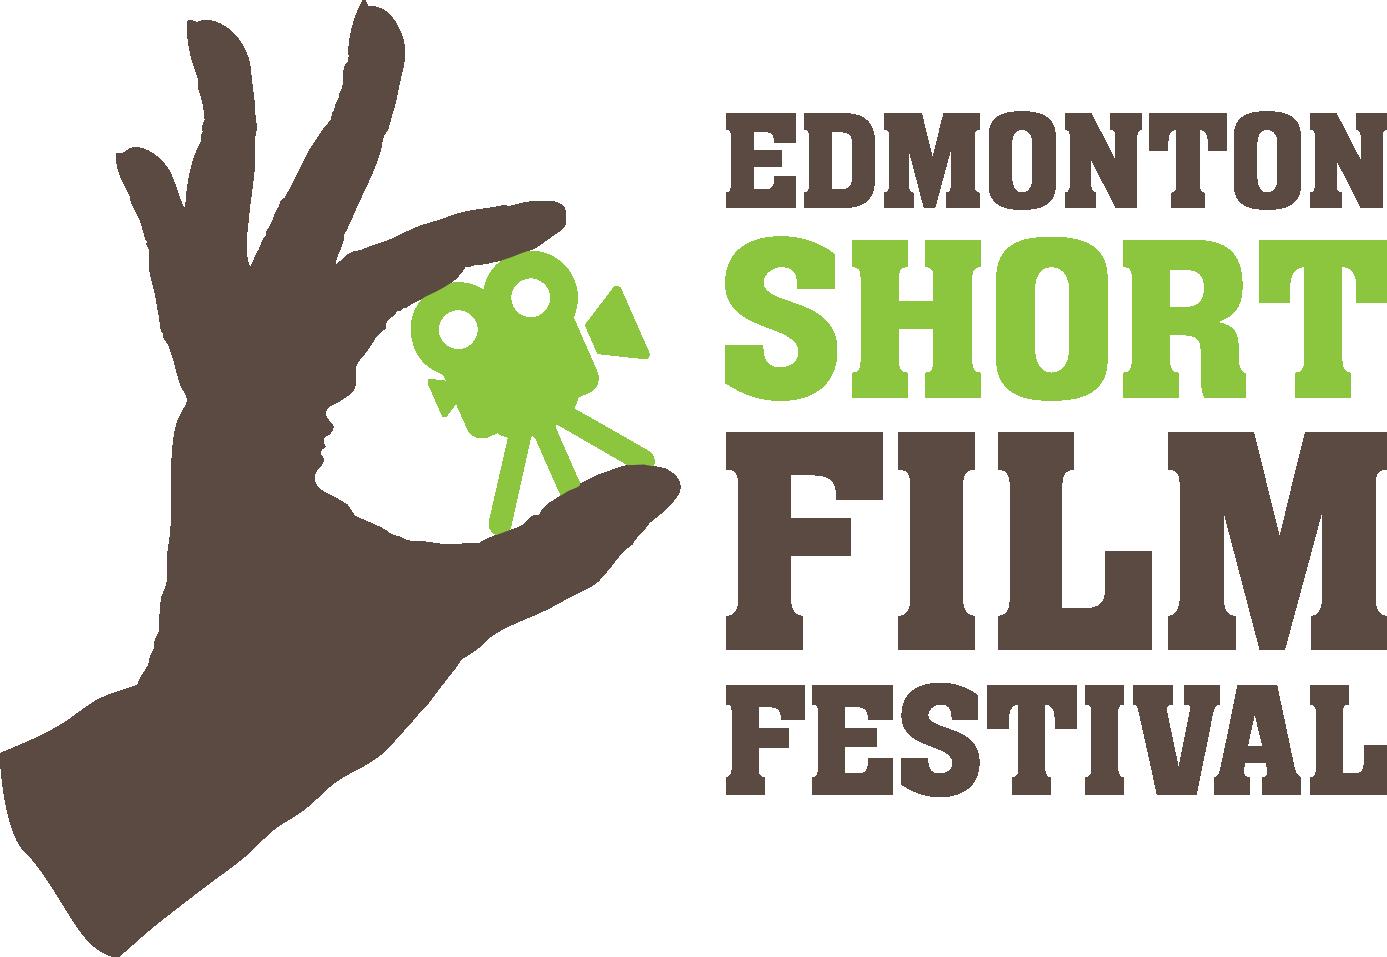 Edmonton Short Film Festival.png